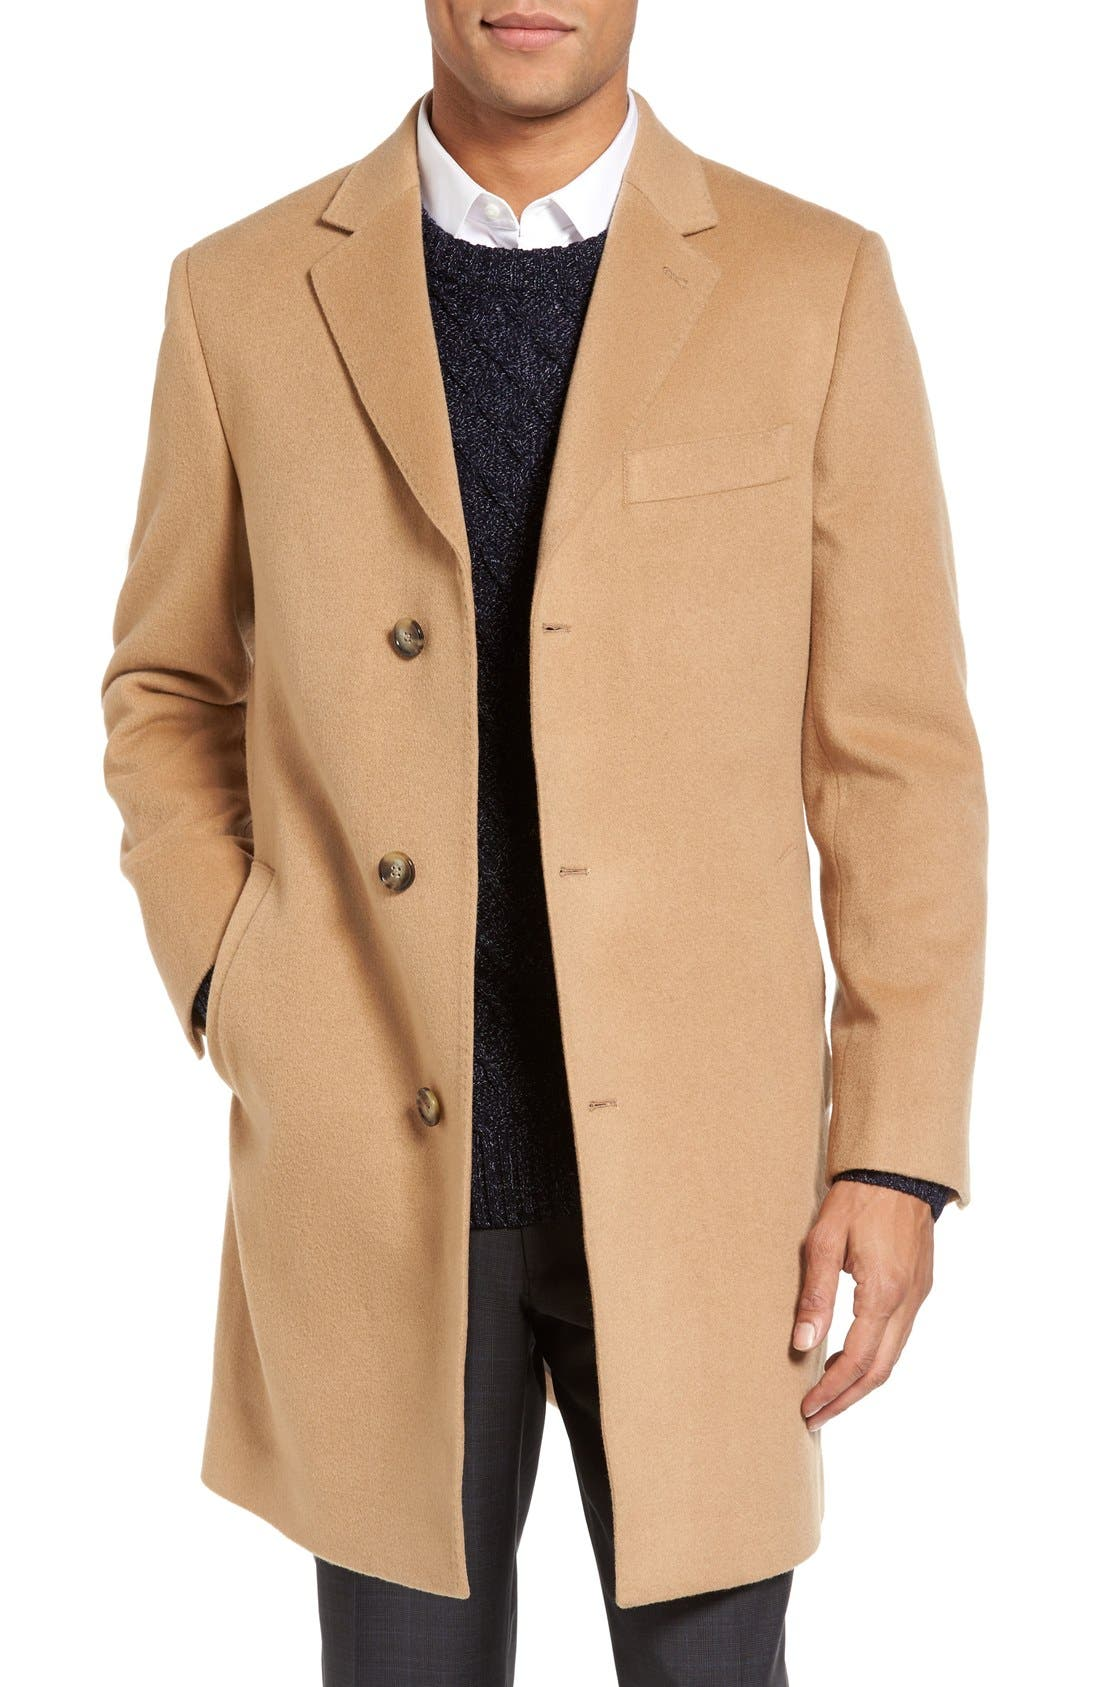 Alternate Image 1 Selected - Nordstrom Men's Shop Freemont Wool & Cashmere Overcoat